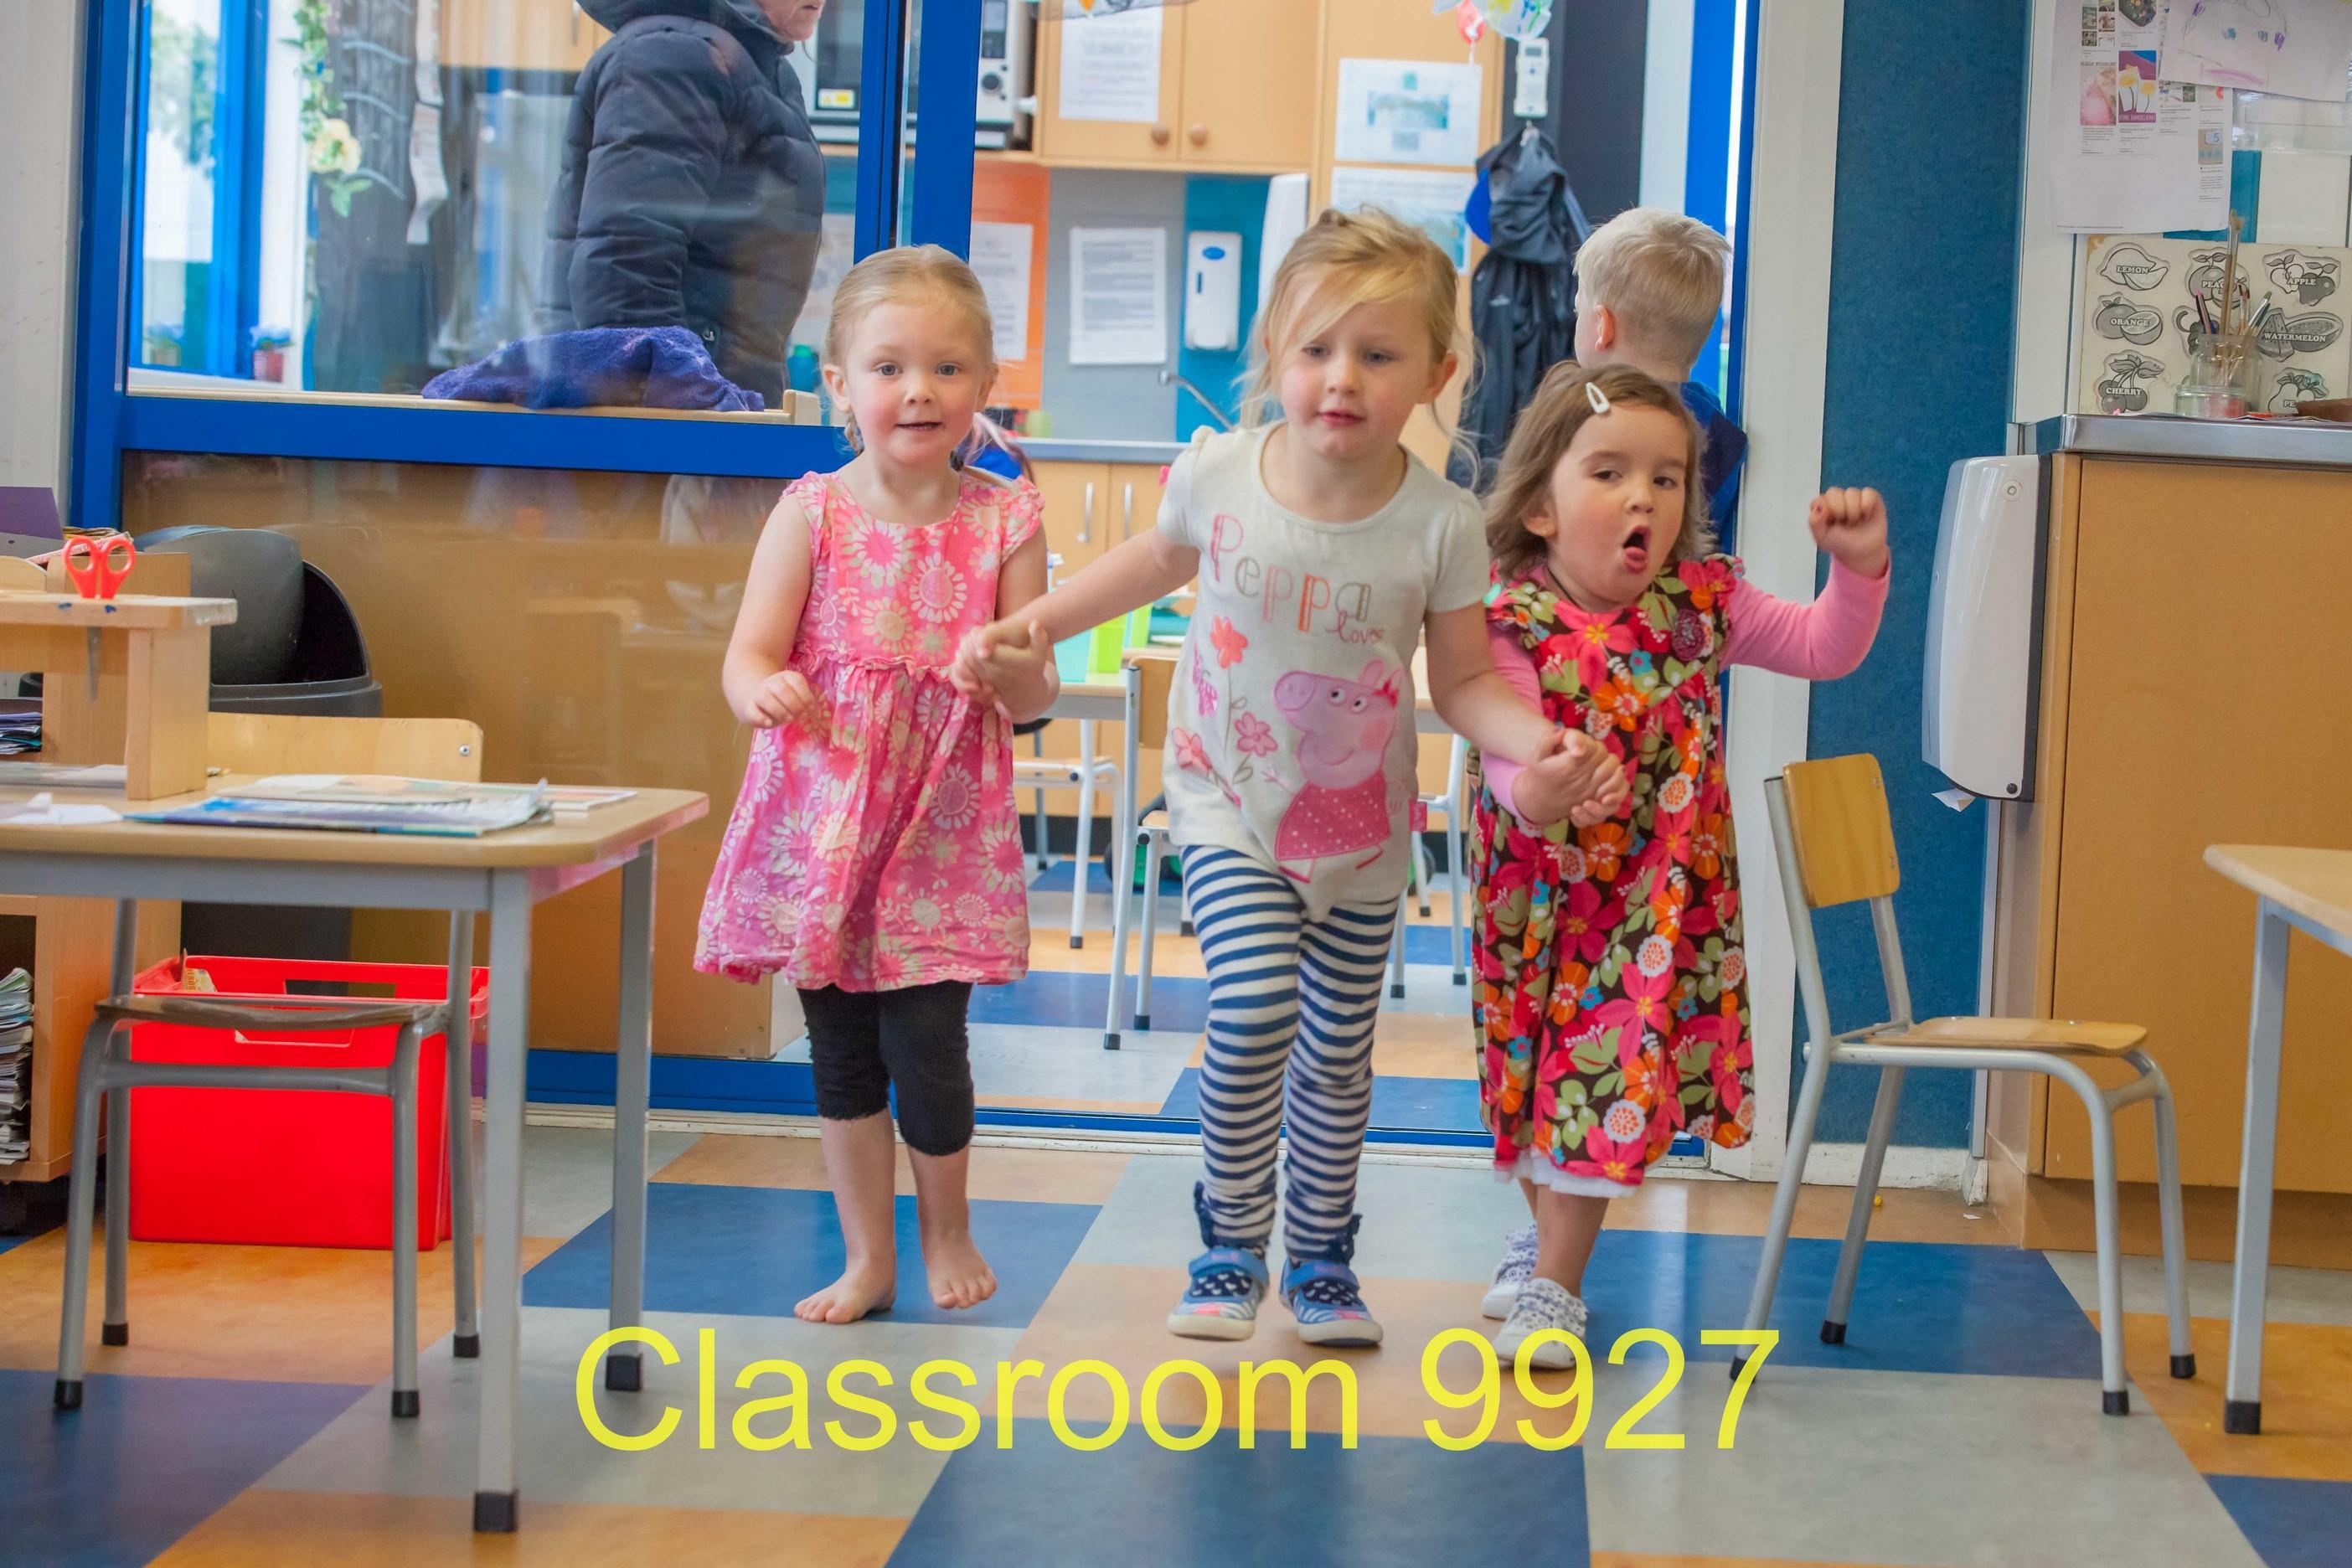 Classroom 9927